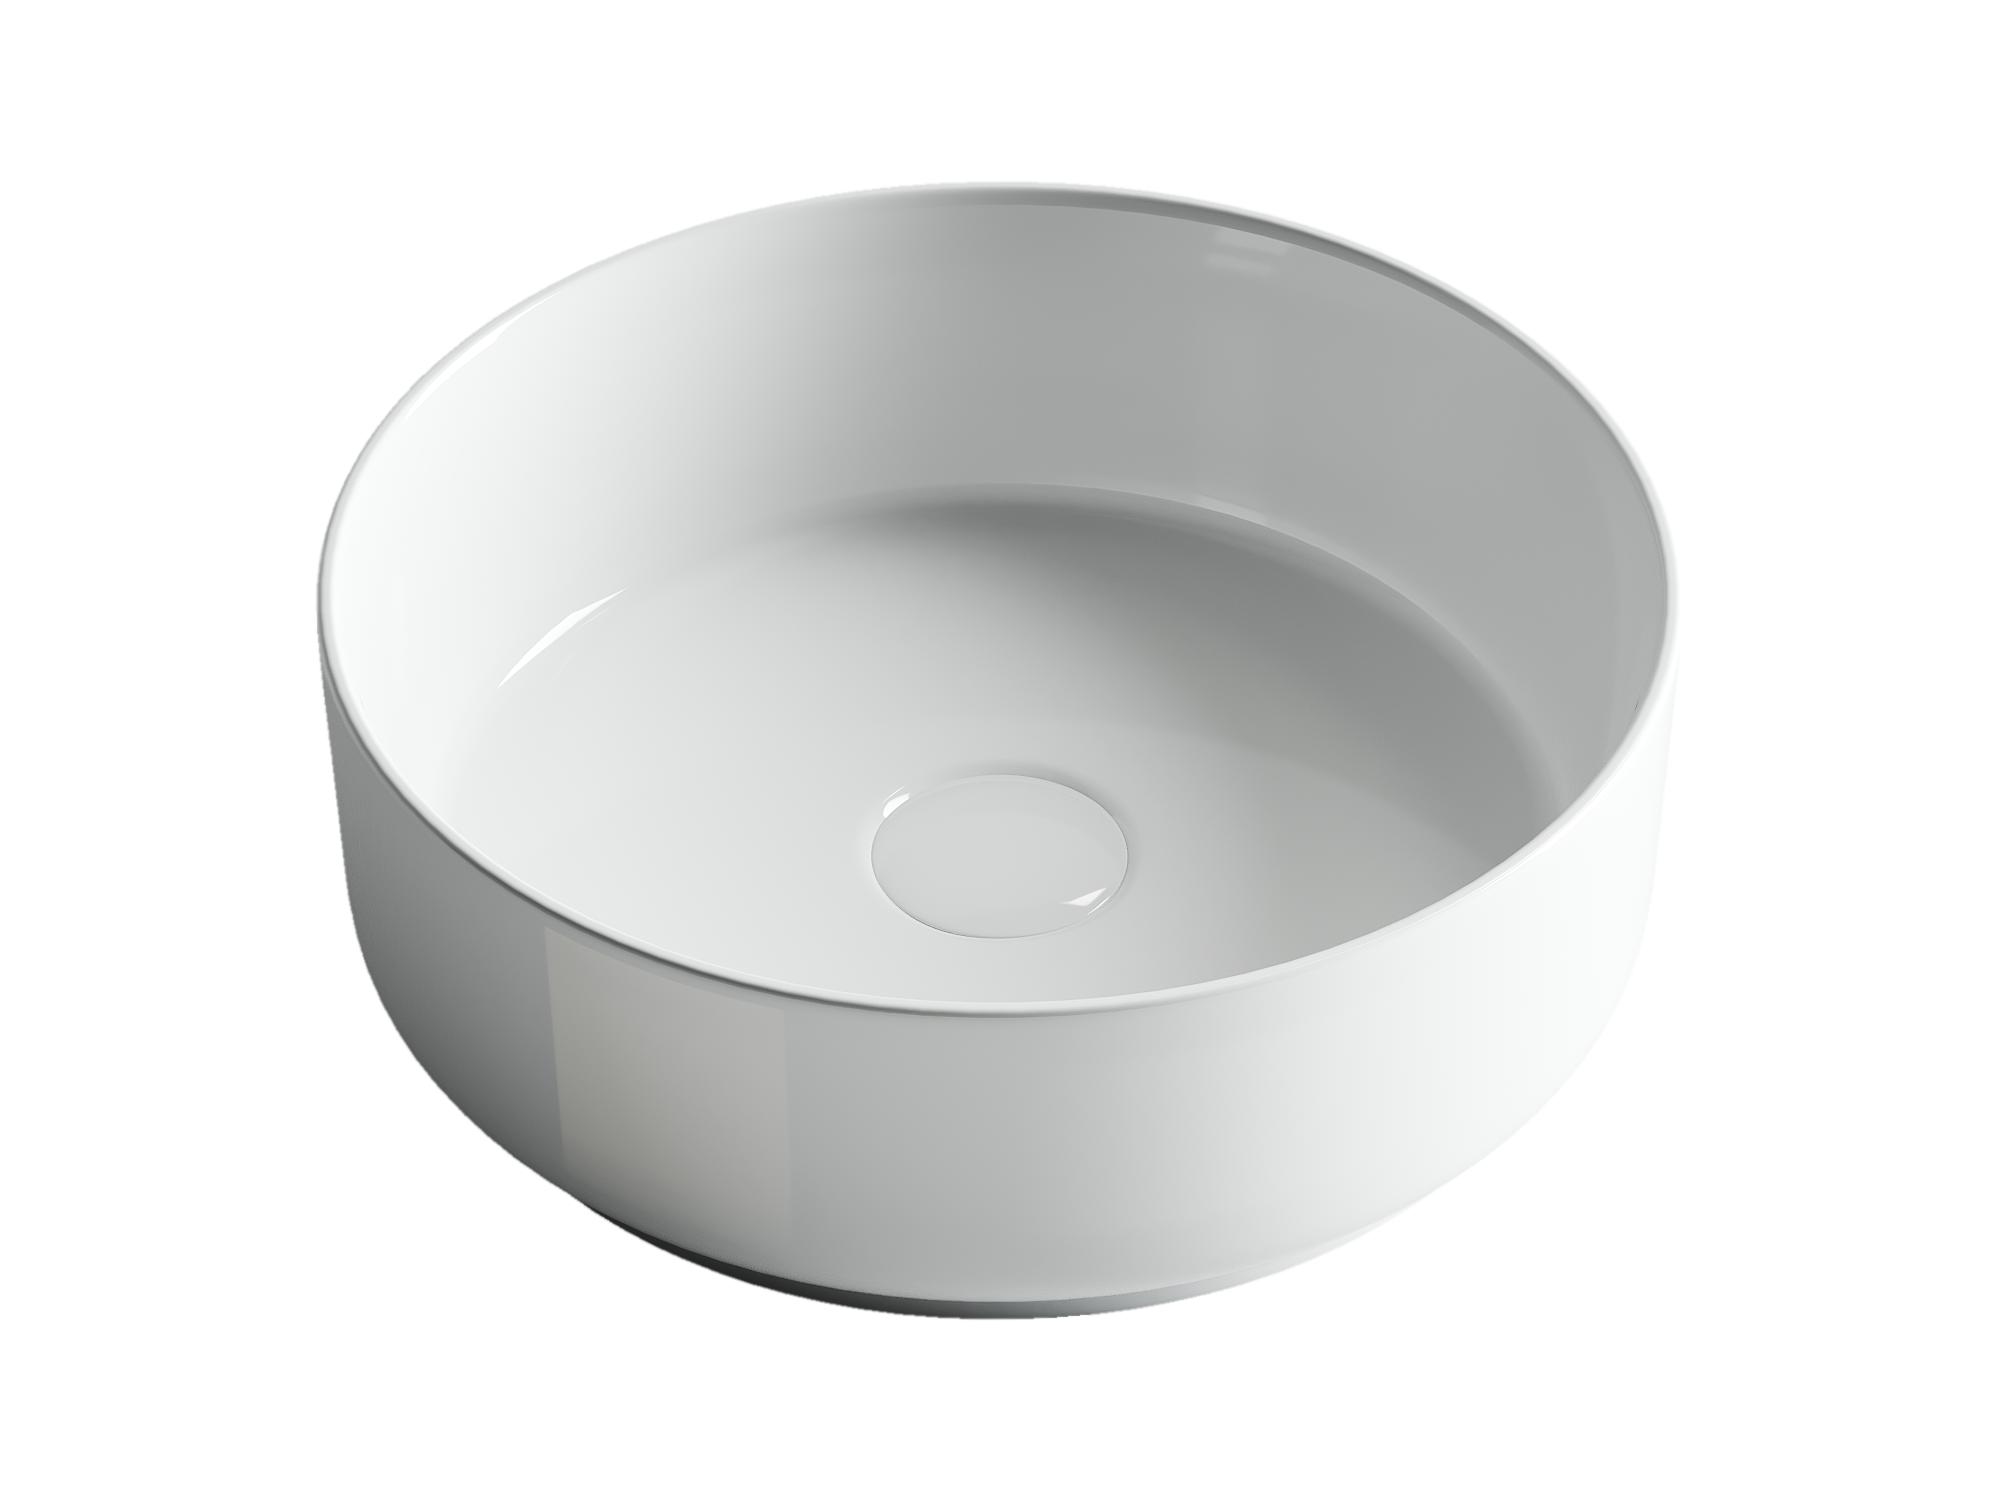 Раковина чаша накладная круглая Ceramica Nova Element CN5001 Белая 360x360x120мм